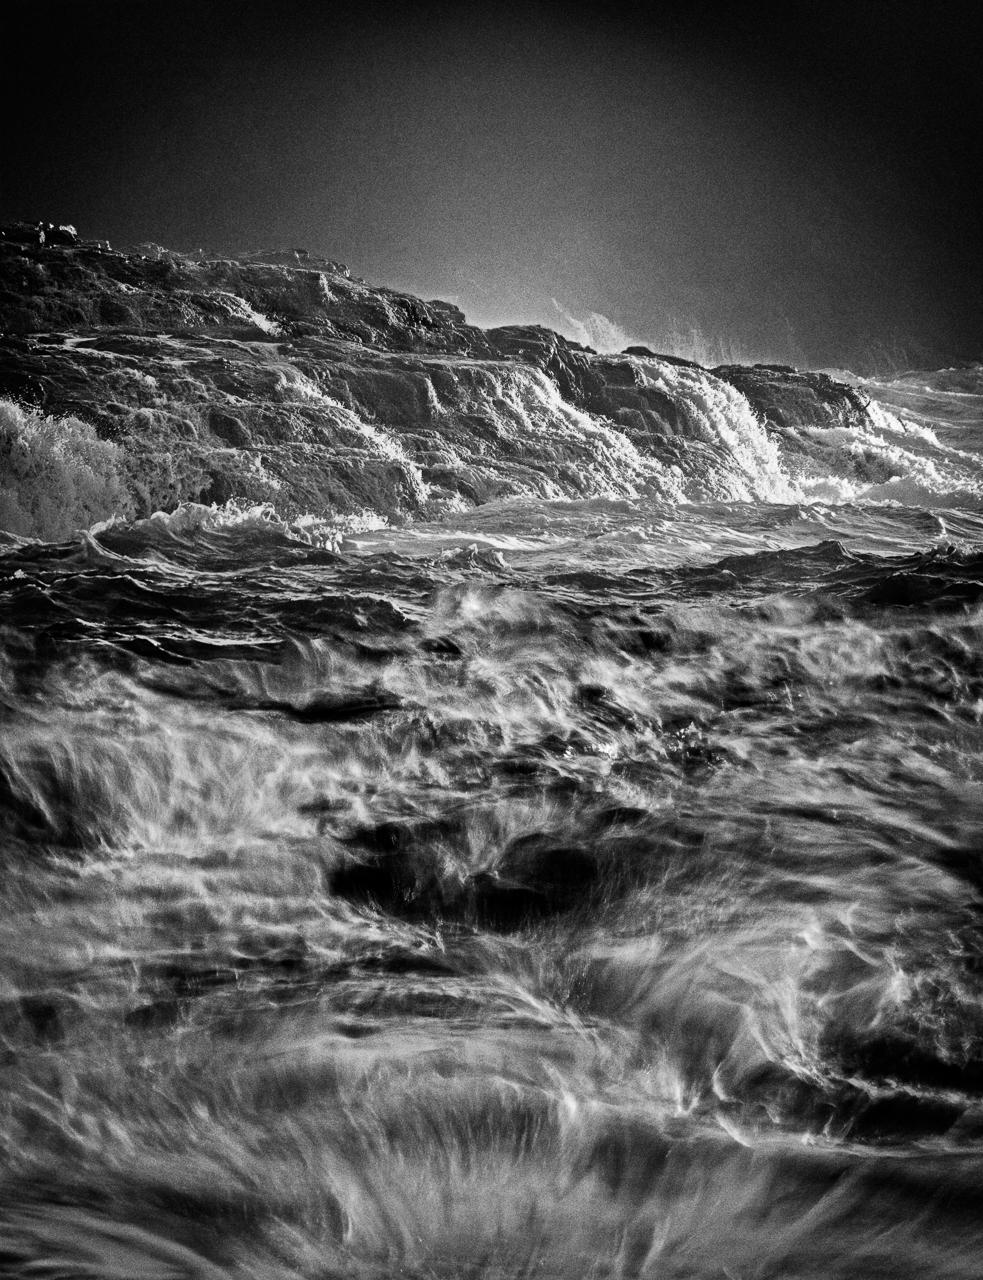 013_Waves#16d.jpg